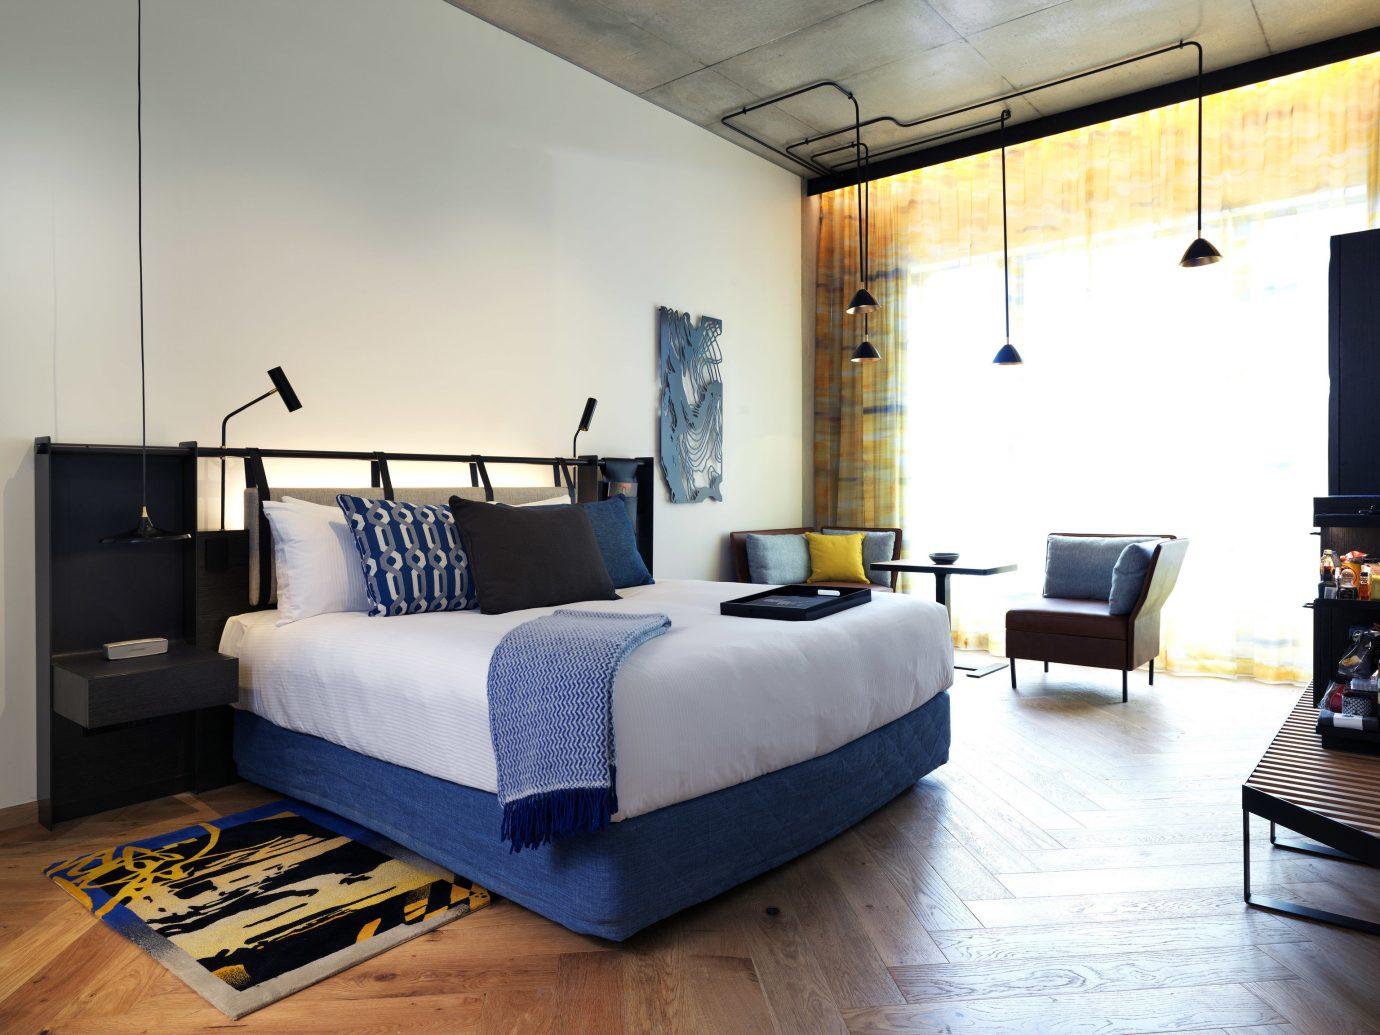 Hotels Romance indoor wall floor room property living room Living interior design Bedroom furniture home real estate bed Design loft bed frame condominium apartment